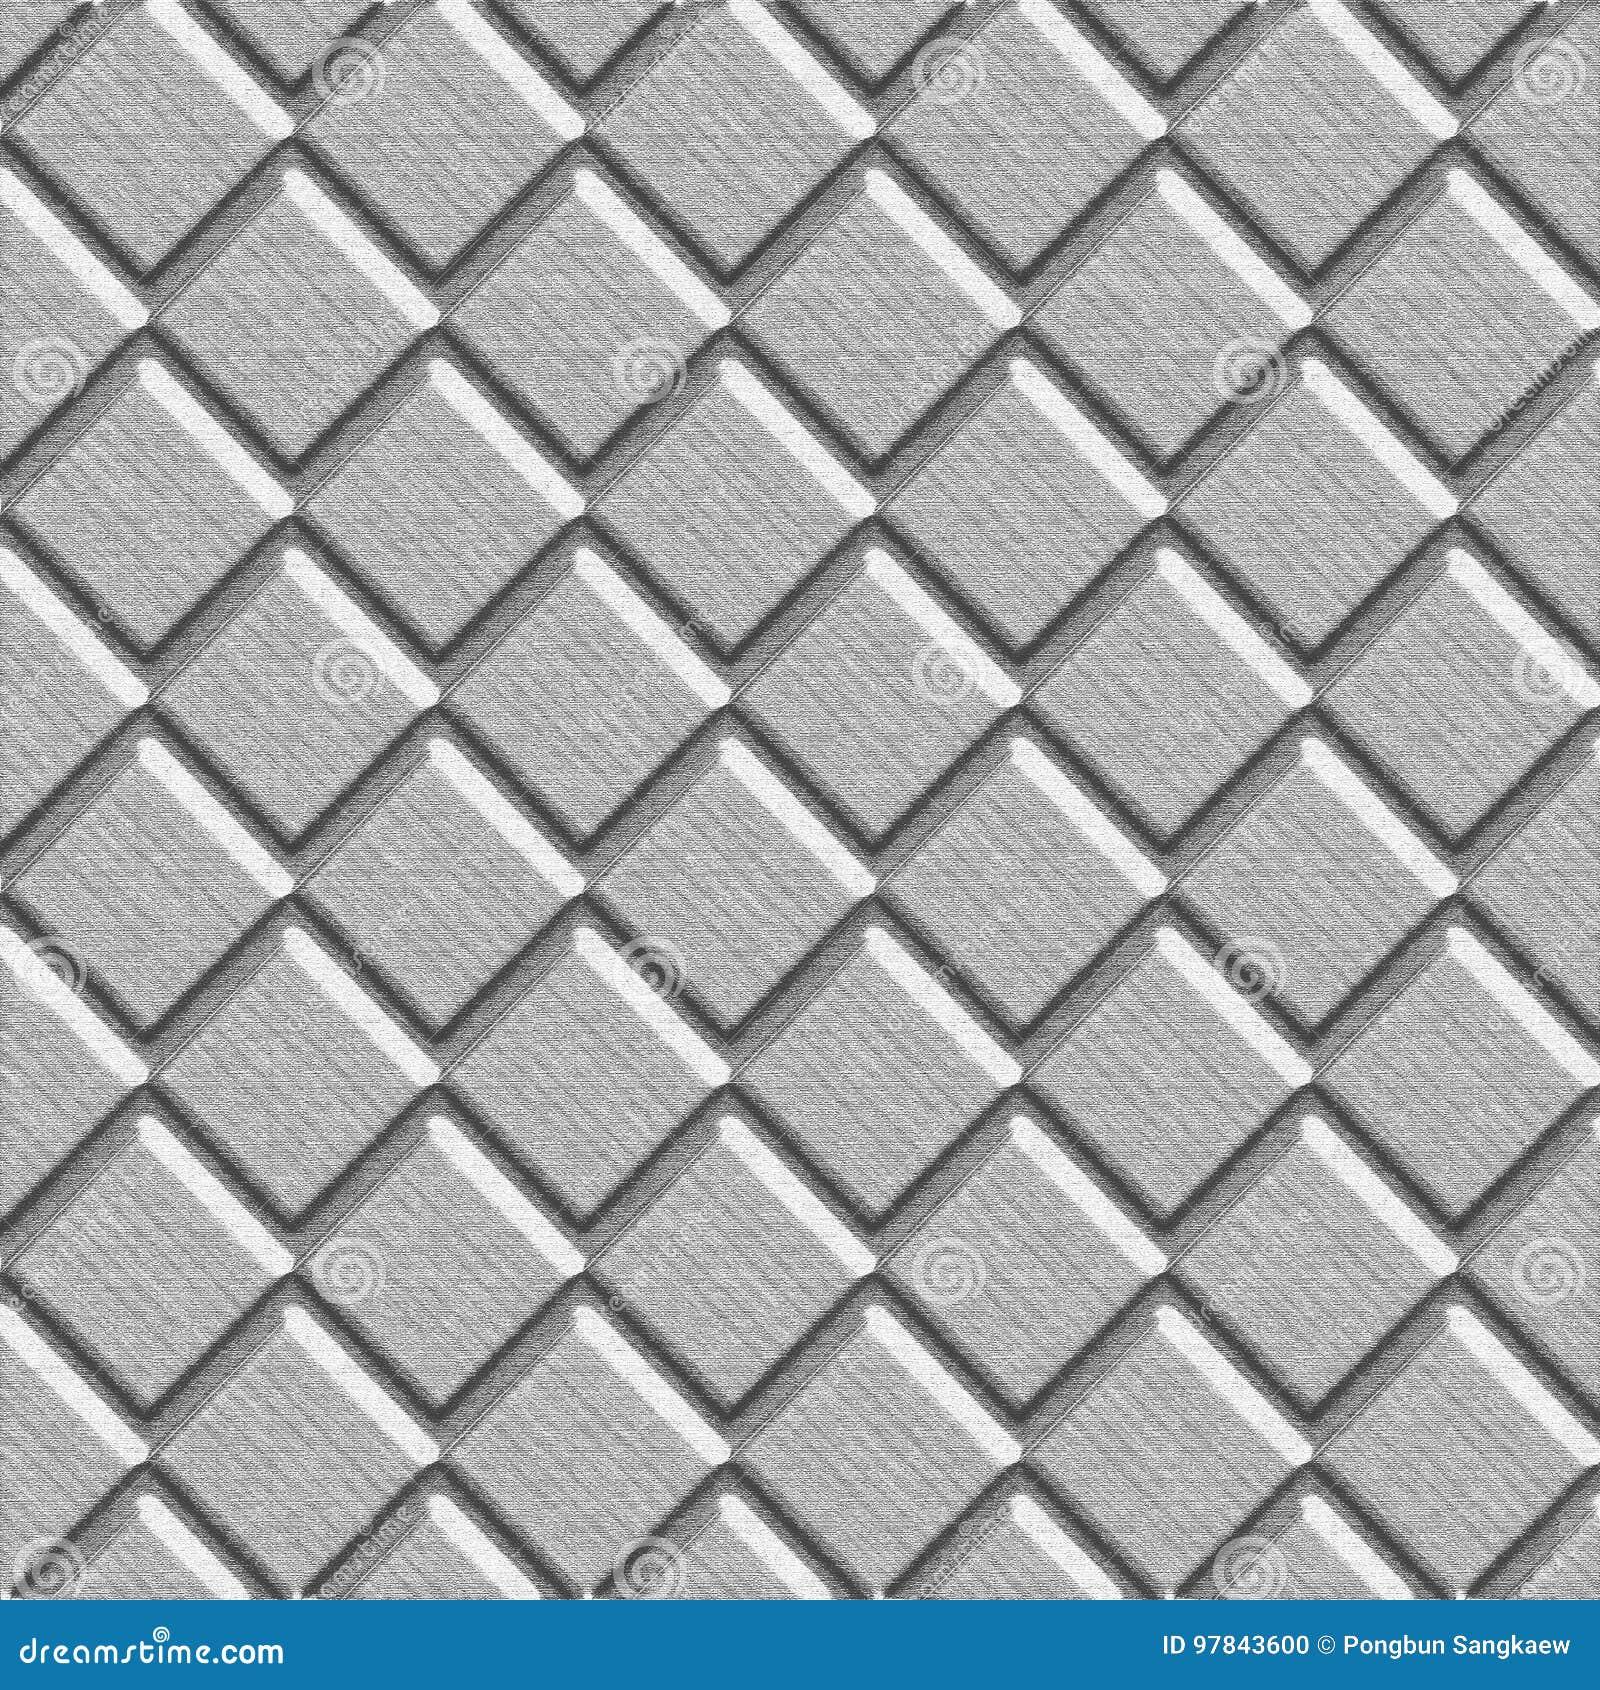 Simple Gray Geometric Wallpaper Background Stock